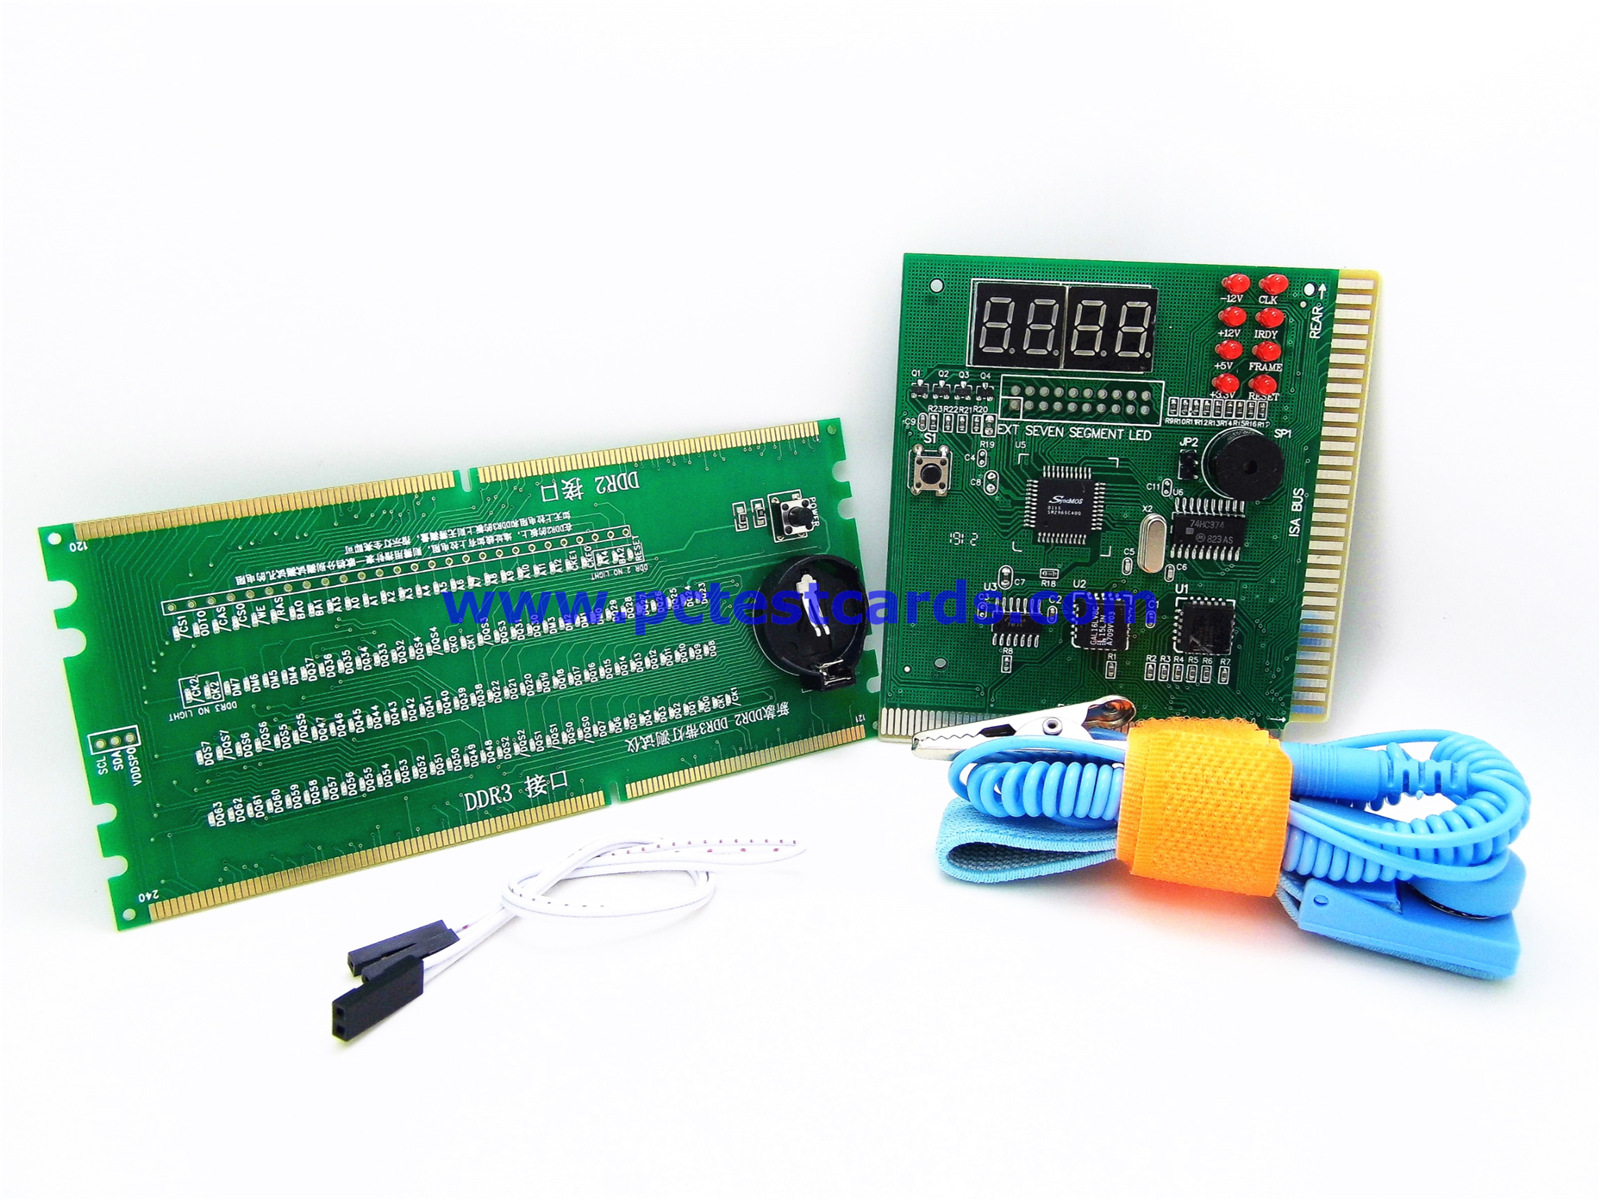 New Desktop PC Computer Motherboard and RAM Slot DDR2 DDR3 Analyzer No POST no Display Digital LED Diagnostic Test Cards Kit